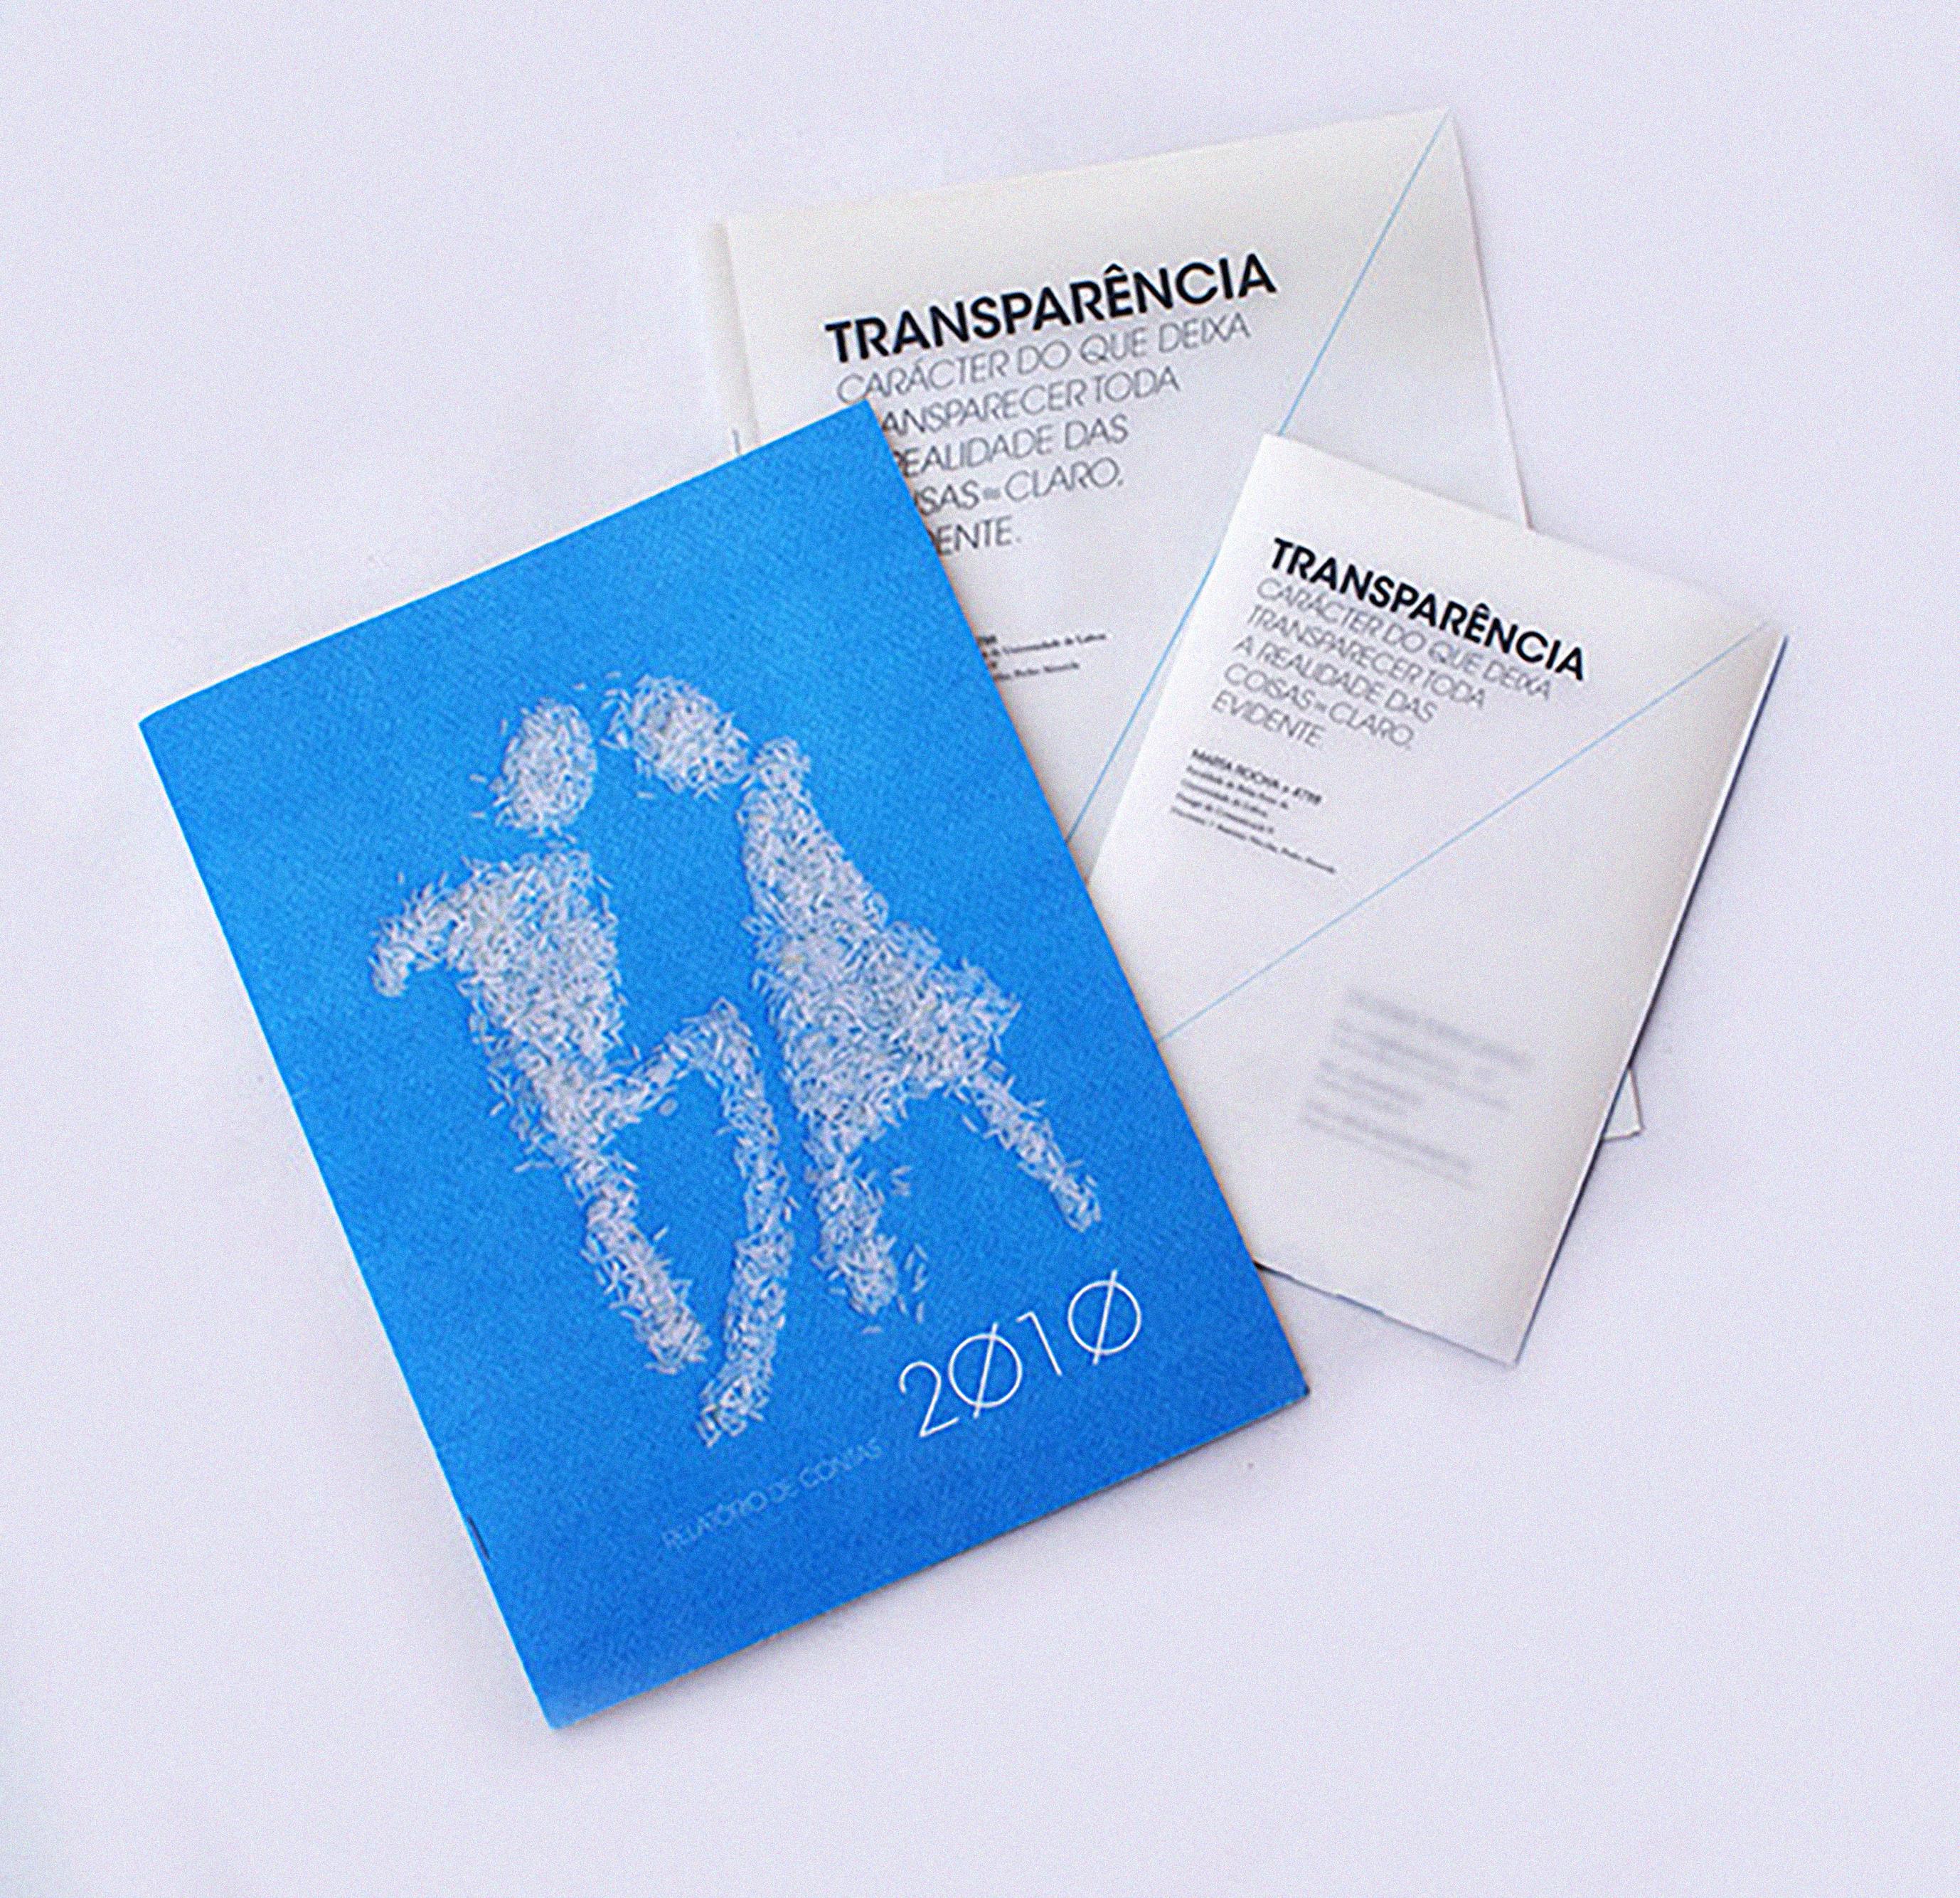 Transparência _BA annual report